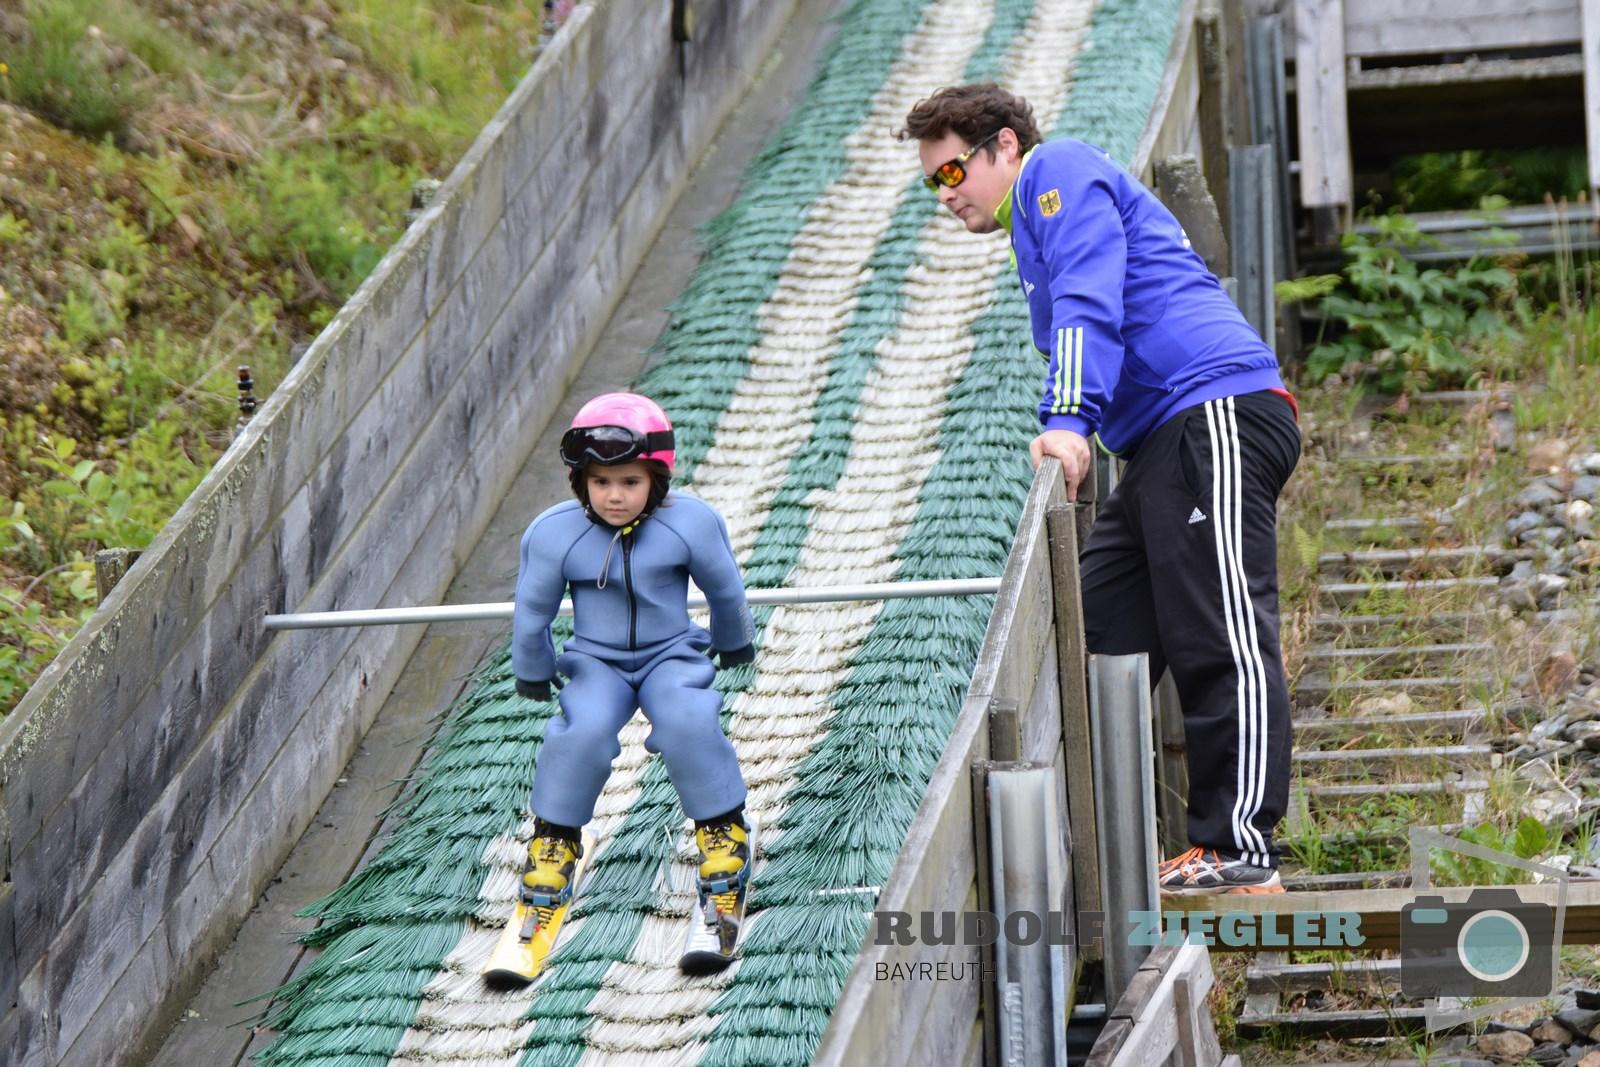 Skispringen Bischofsgrün 022-A (1600x1200)